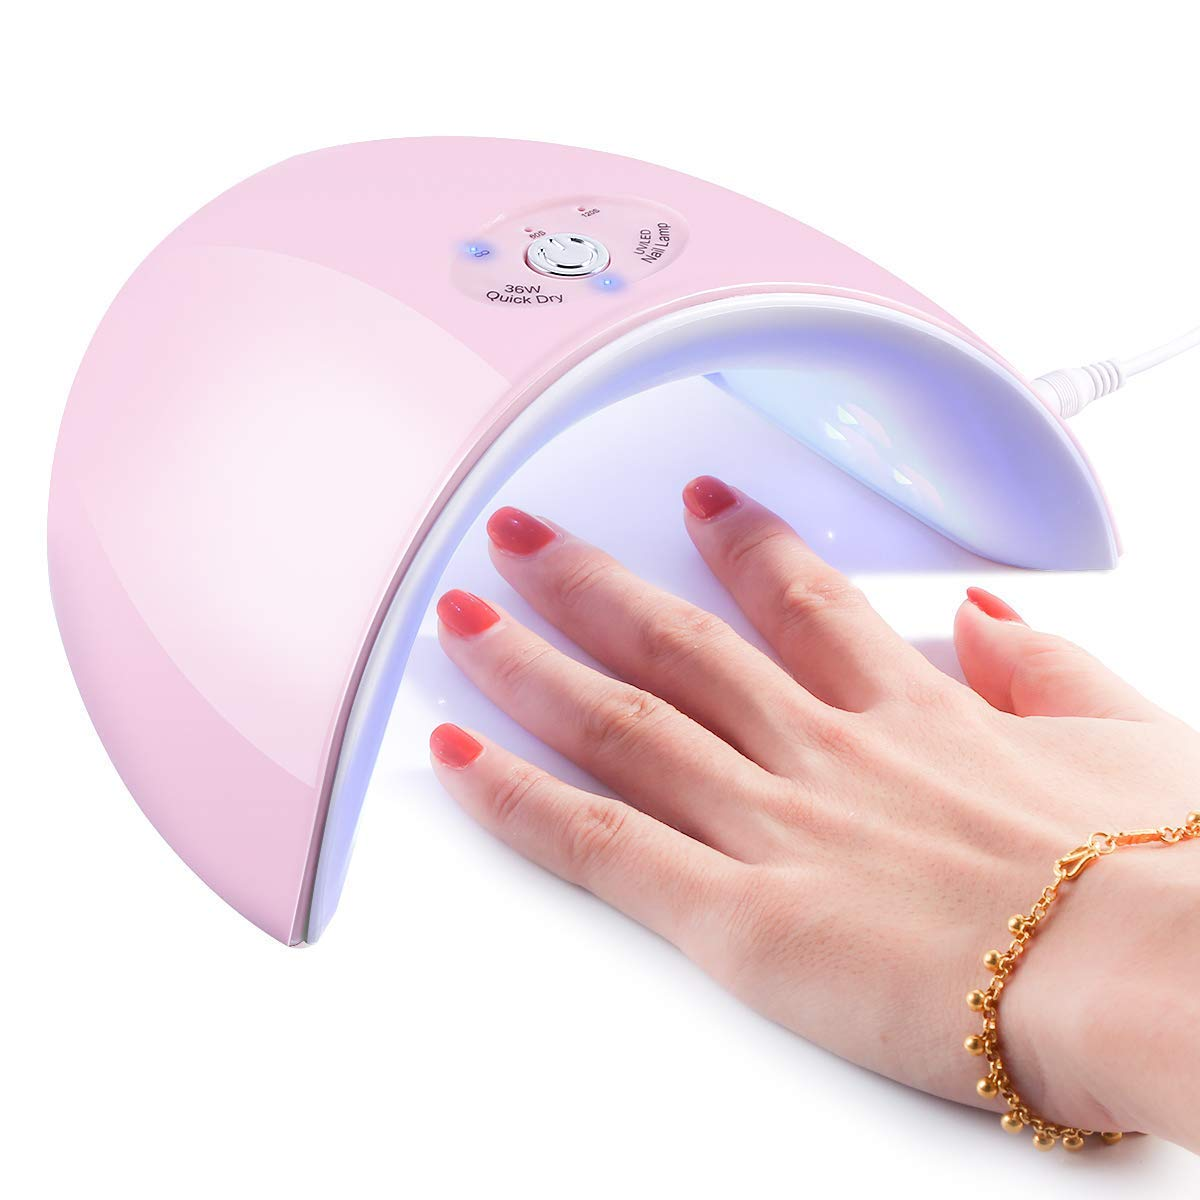 36W UV Light Nail Lamp, Portable 12 LED Nail Curing Lamp Nail Dryer with LED Display, Nail Art Tools with 60s/120s Timer Setting for Manicure Gel Nail Polish Fingernail & Toenail Gel (White) Yinuoday